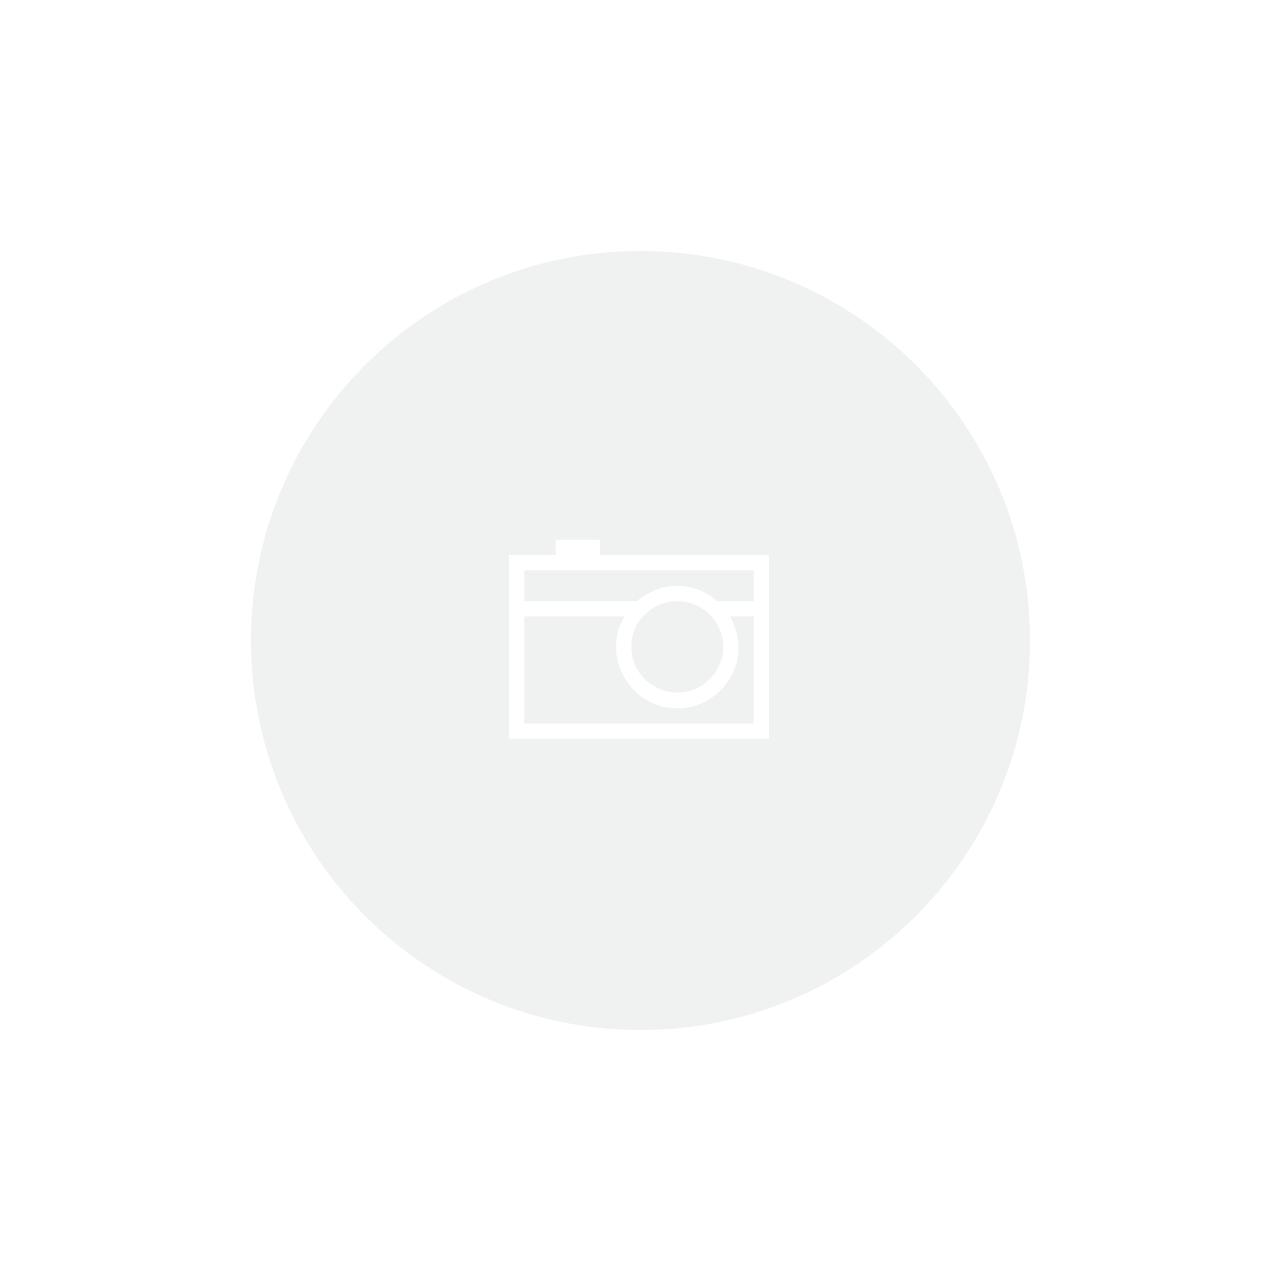 Pegador Multiuso 35 cm em Silicone Apreciatta Tramontina